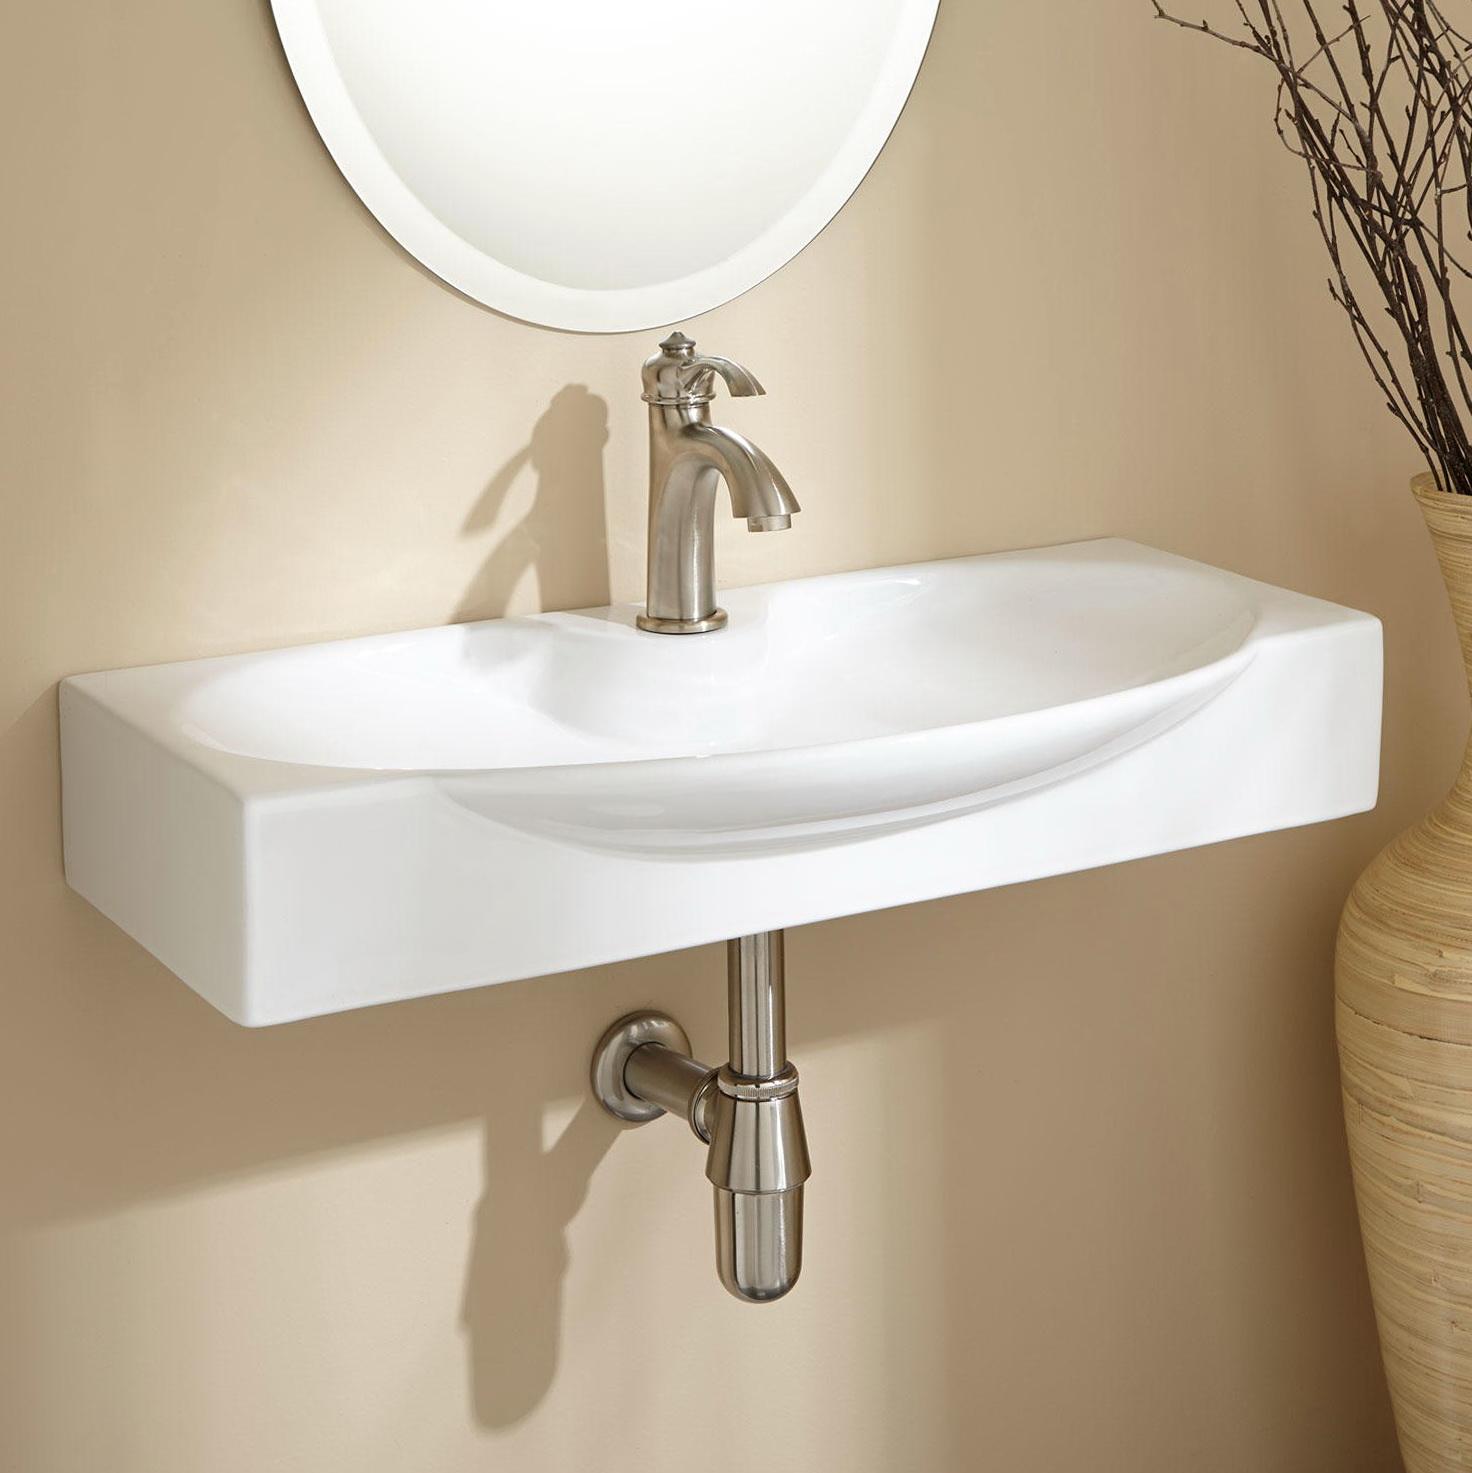 Small Bathroom Sinks Wall Mount